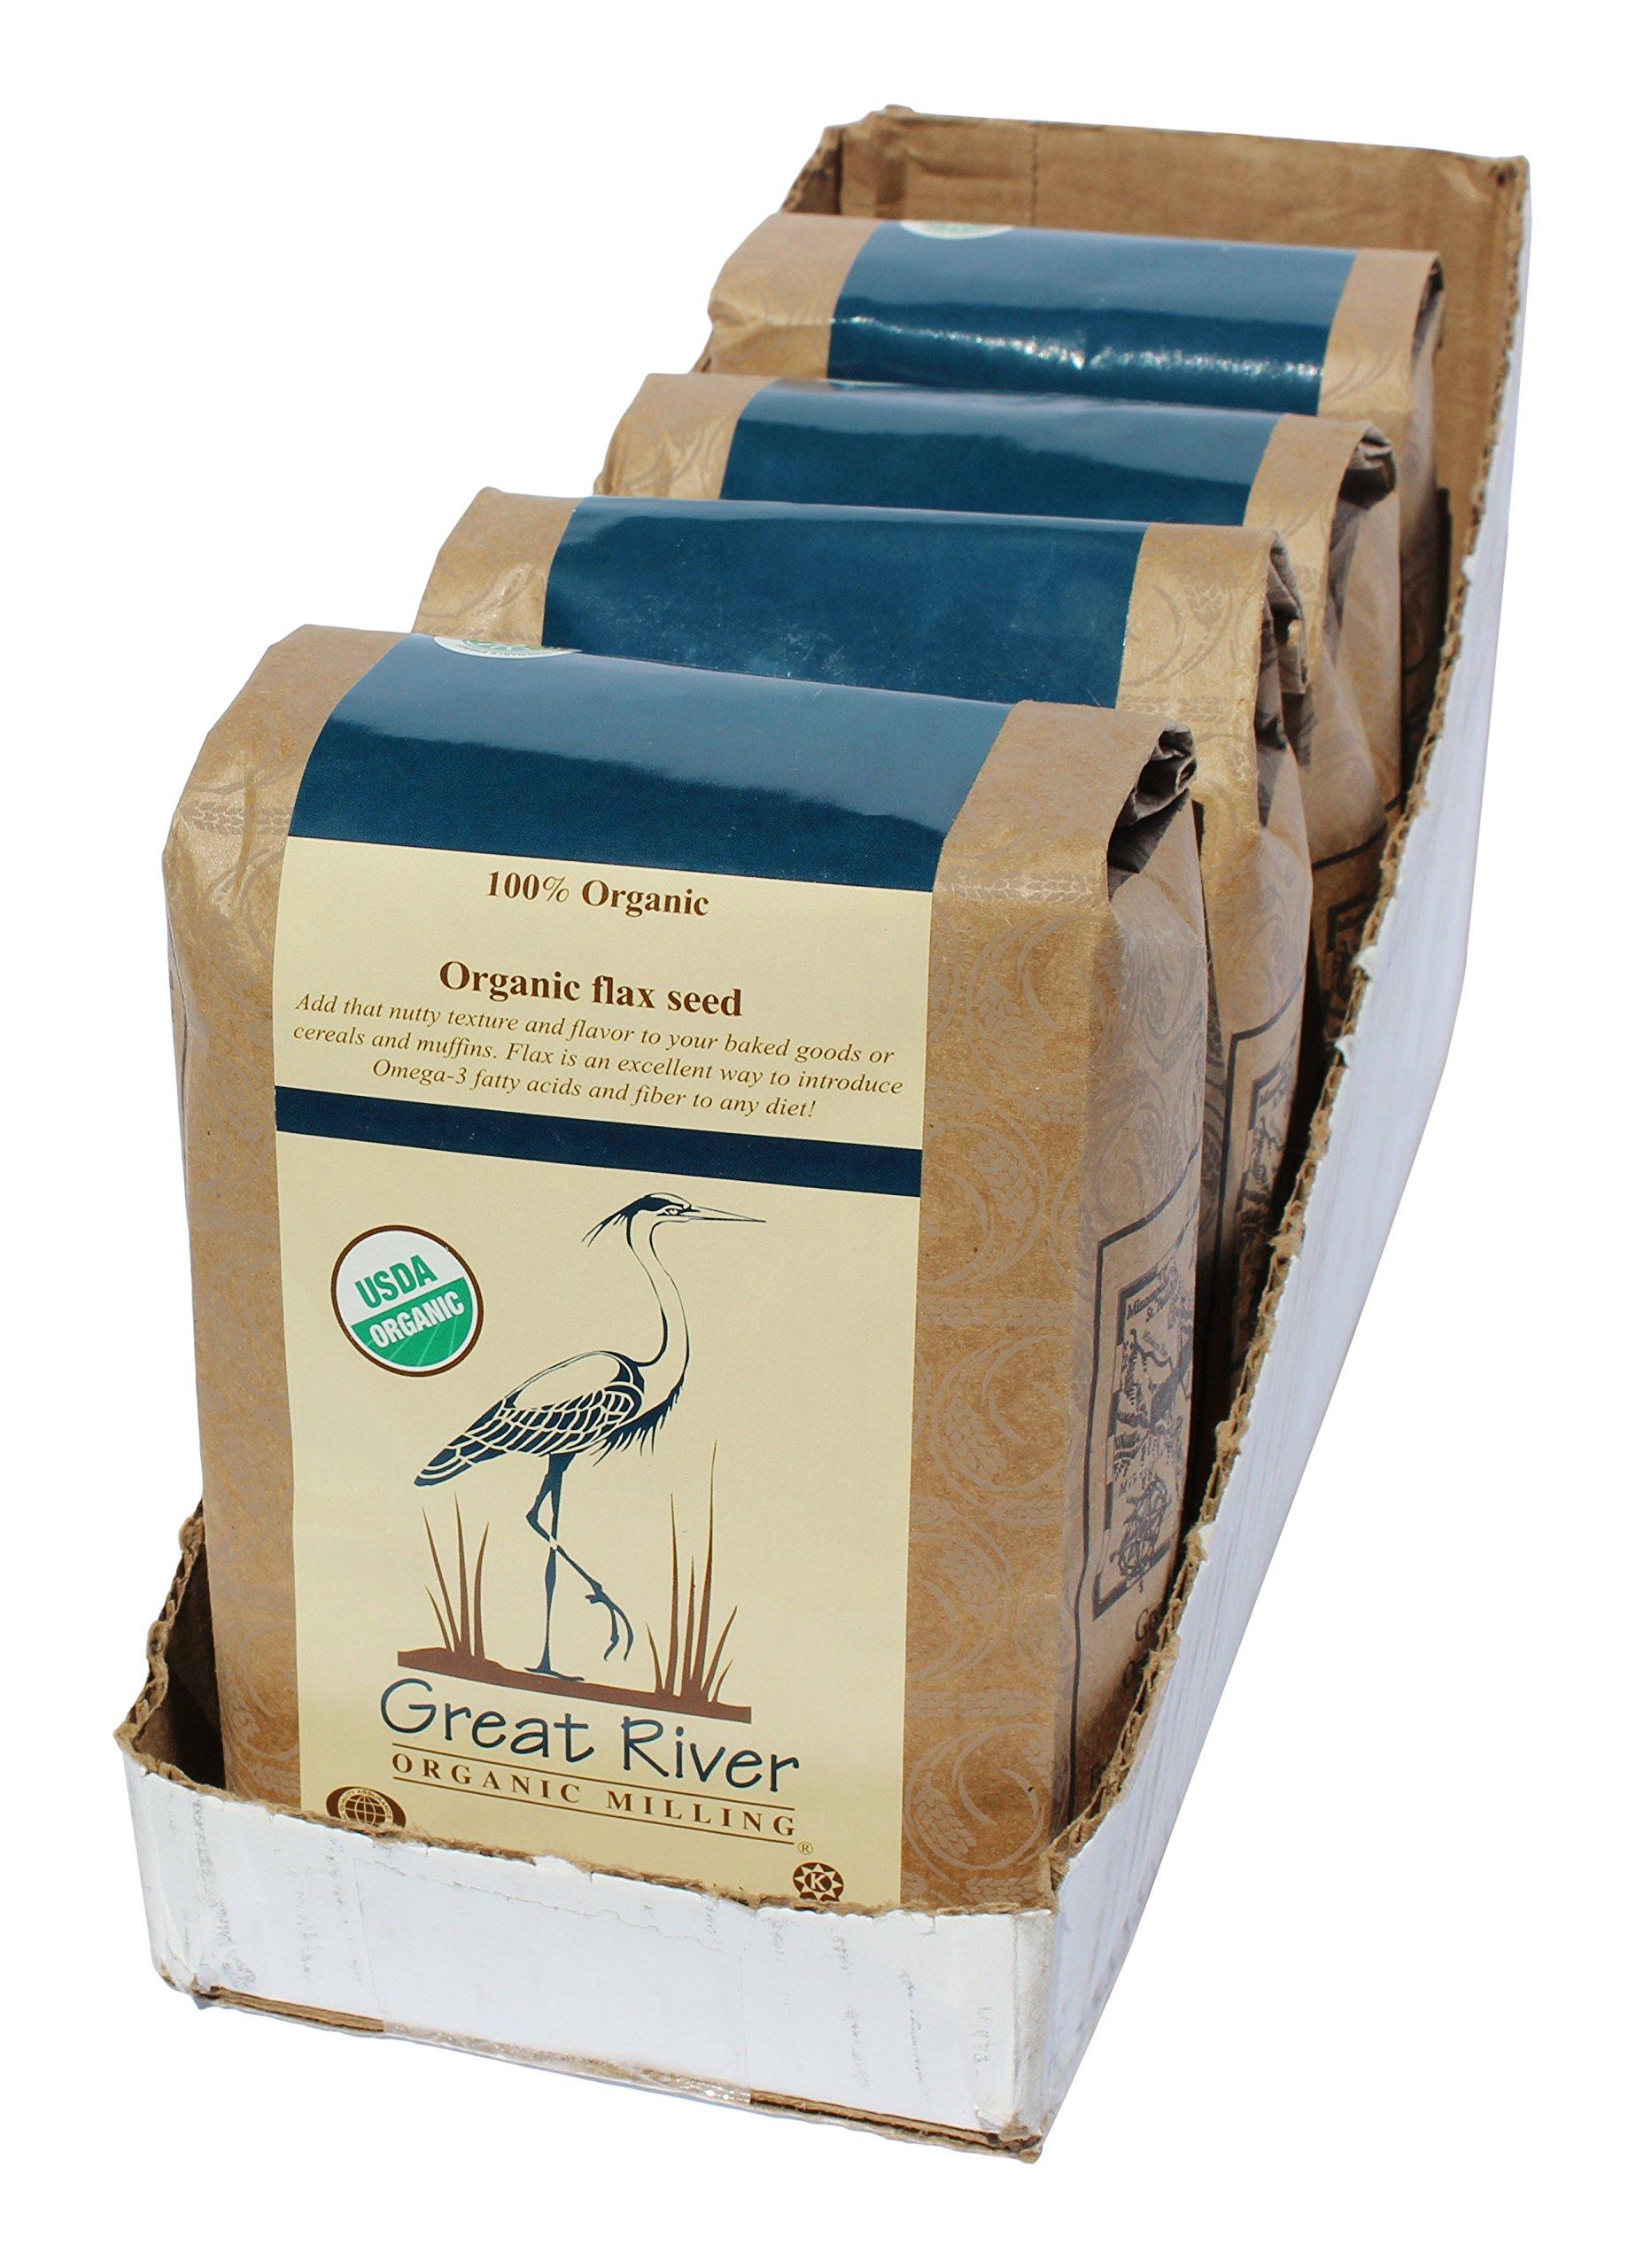 Great River Organic Milling Organic Flax Seed, 2 Pound by Great River Organic Milling (Image #1)